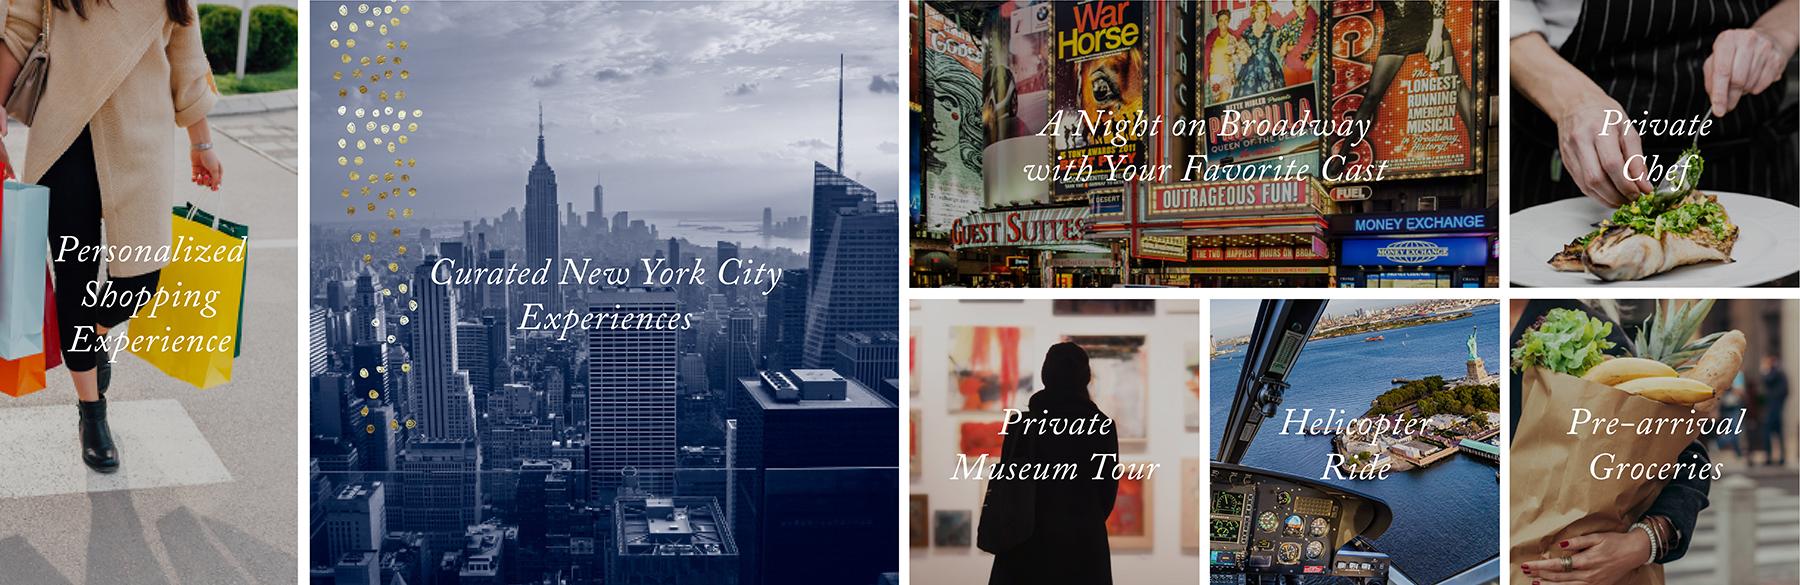 KEY New York City